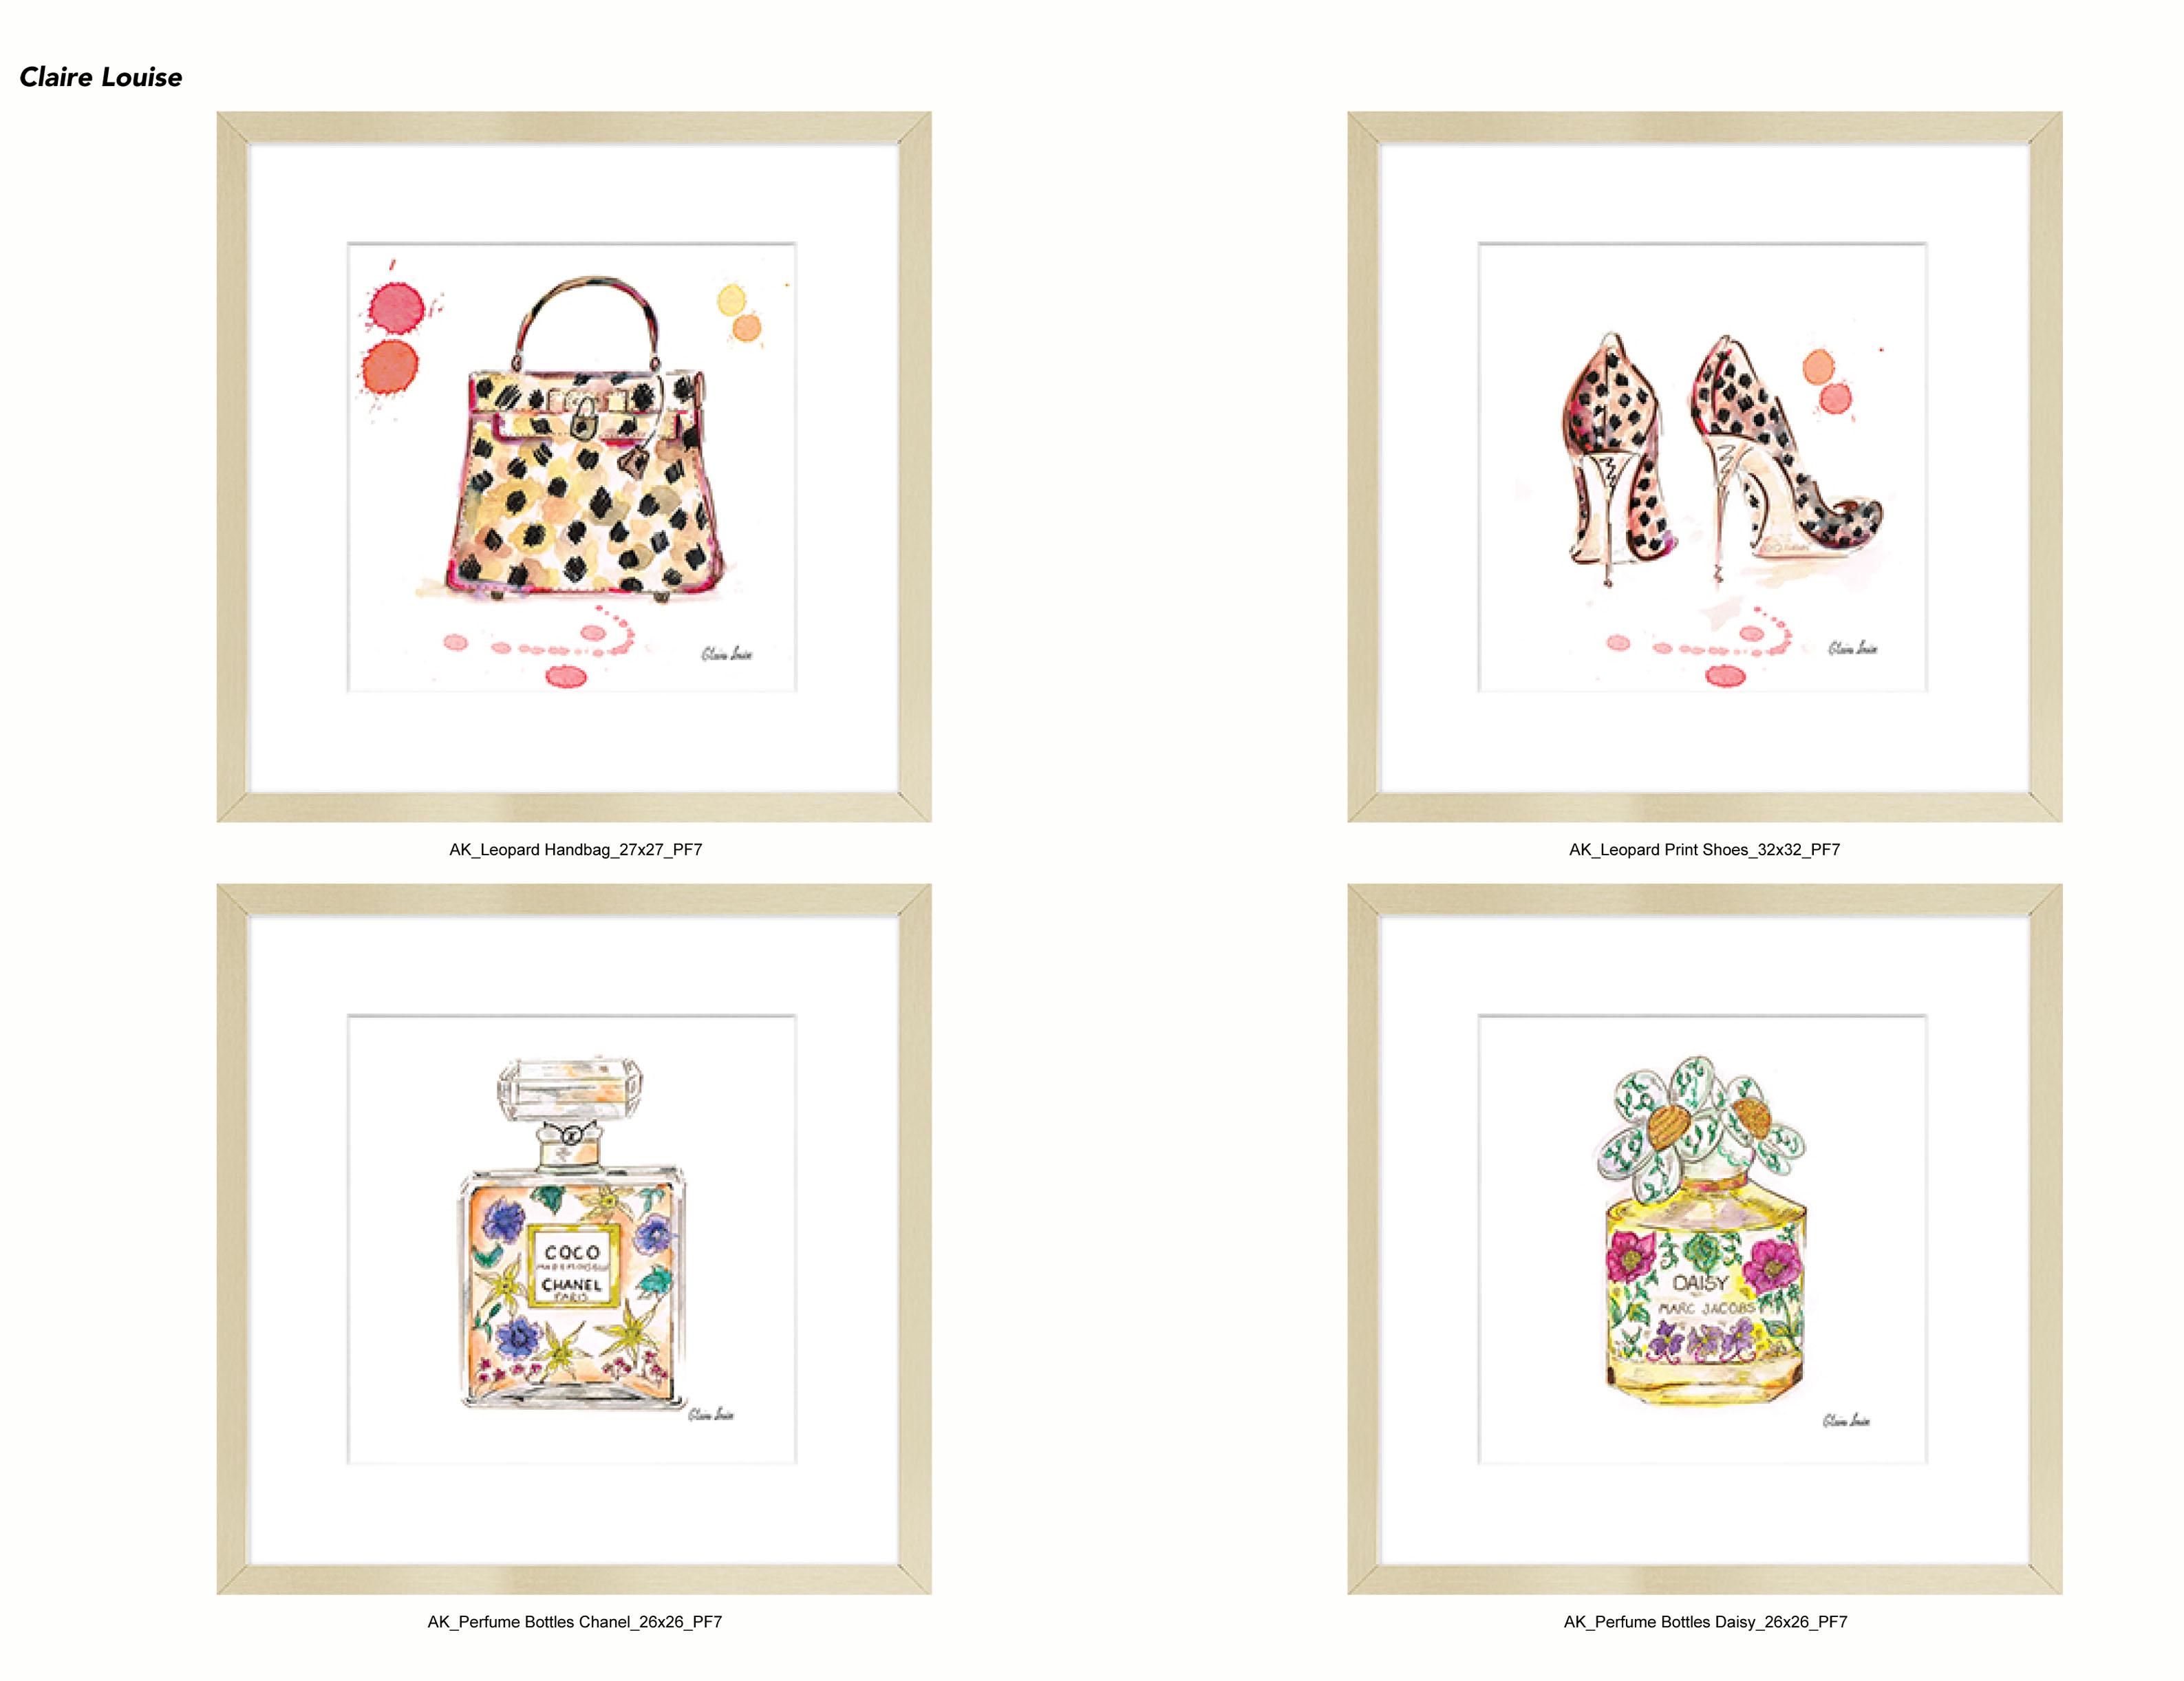 CL Artko Final Prints July 2019